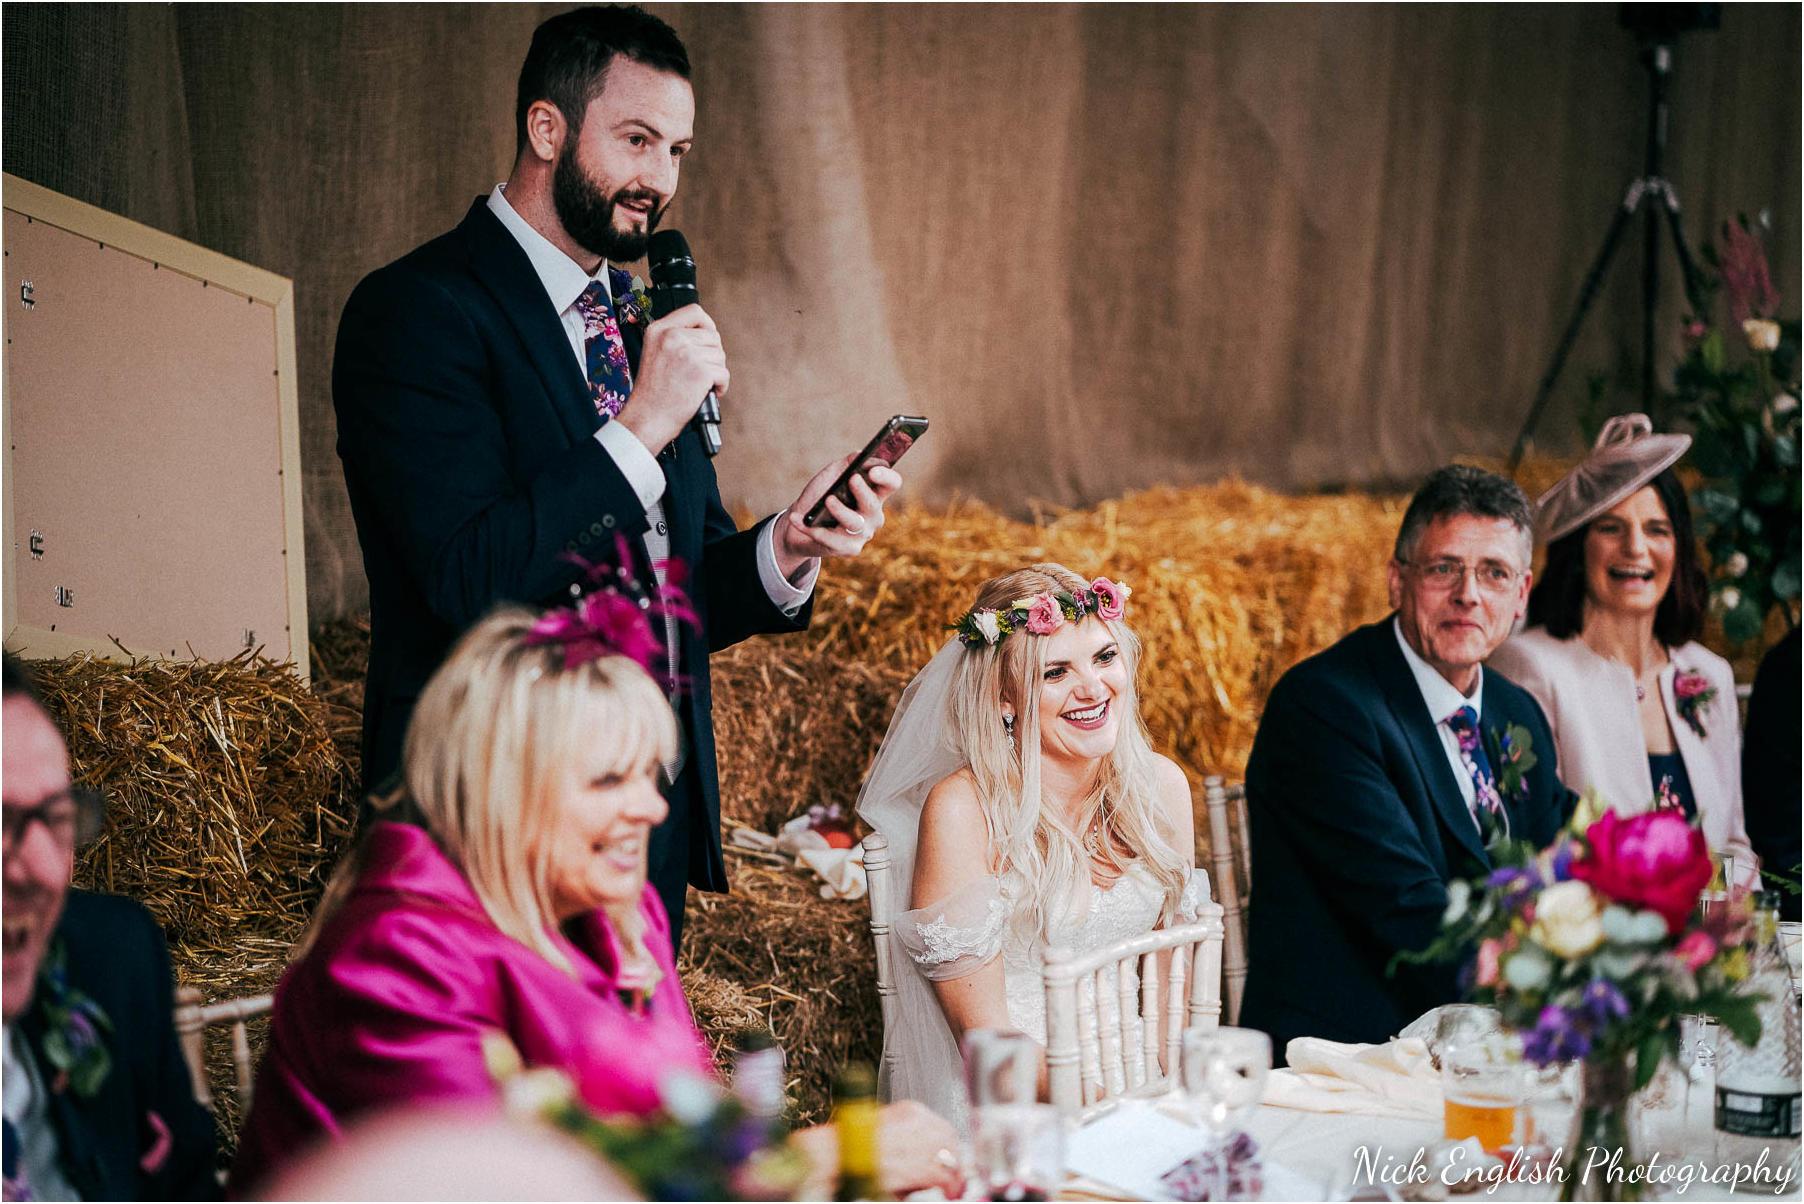 Whitebottom_Farm_Wedding_Manchester_Photograph-81.jpg